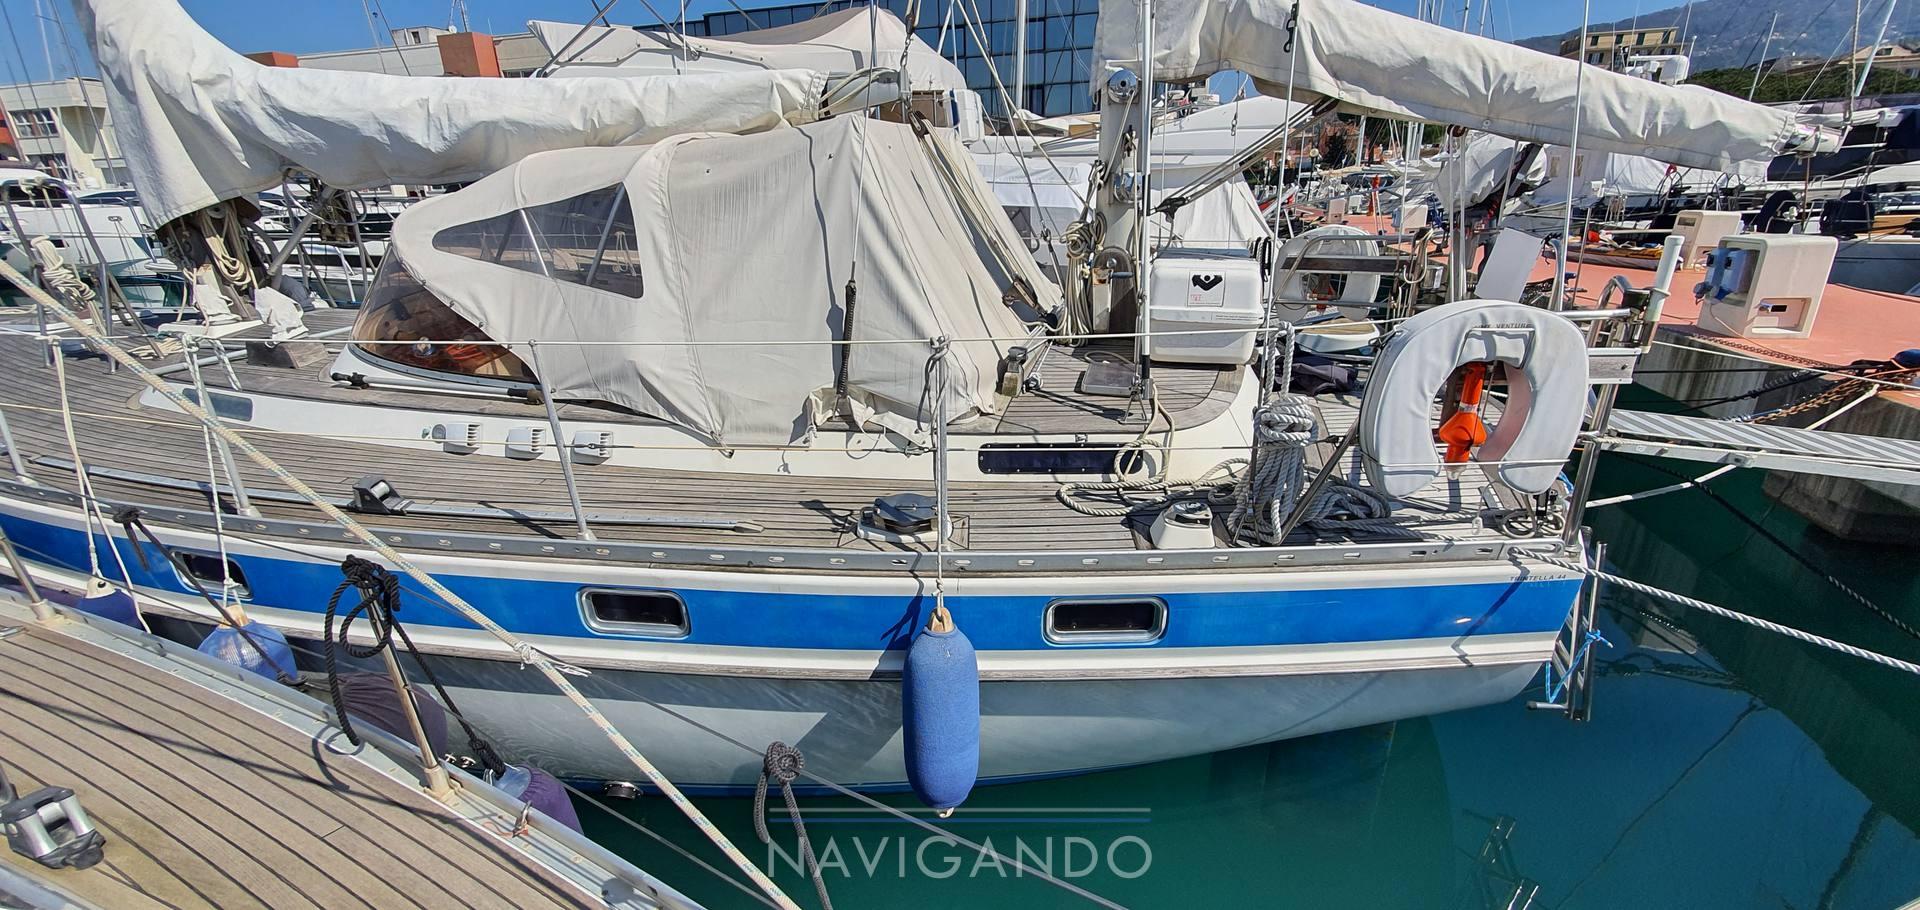 Trintella 44 ketch sailing boat